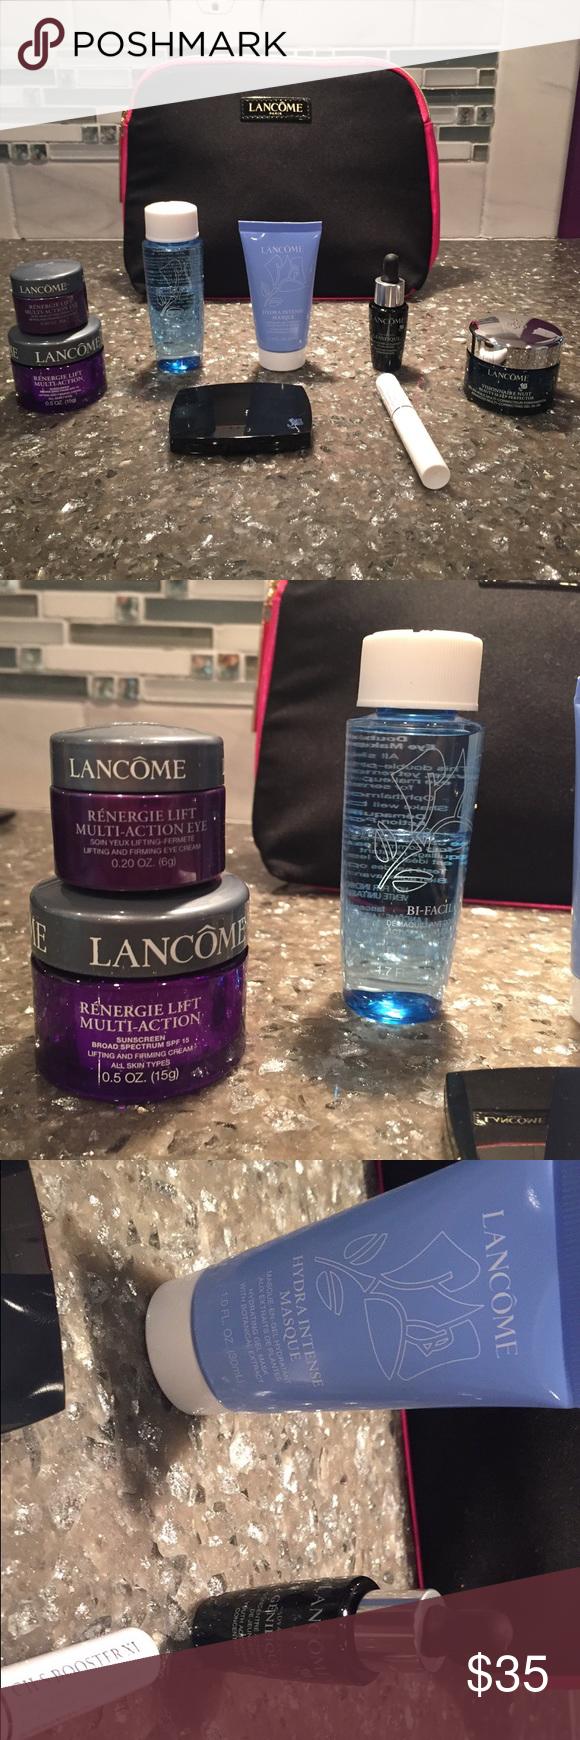 Cosmetics Set Set Includes Lancôme Makeup Bag